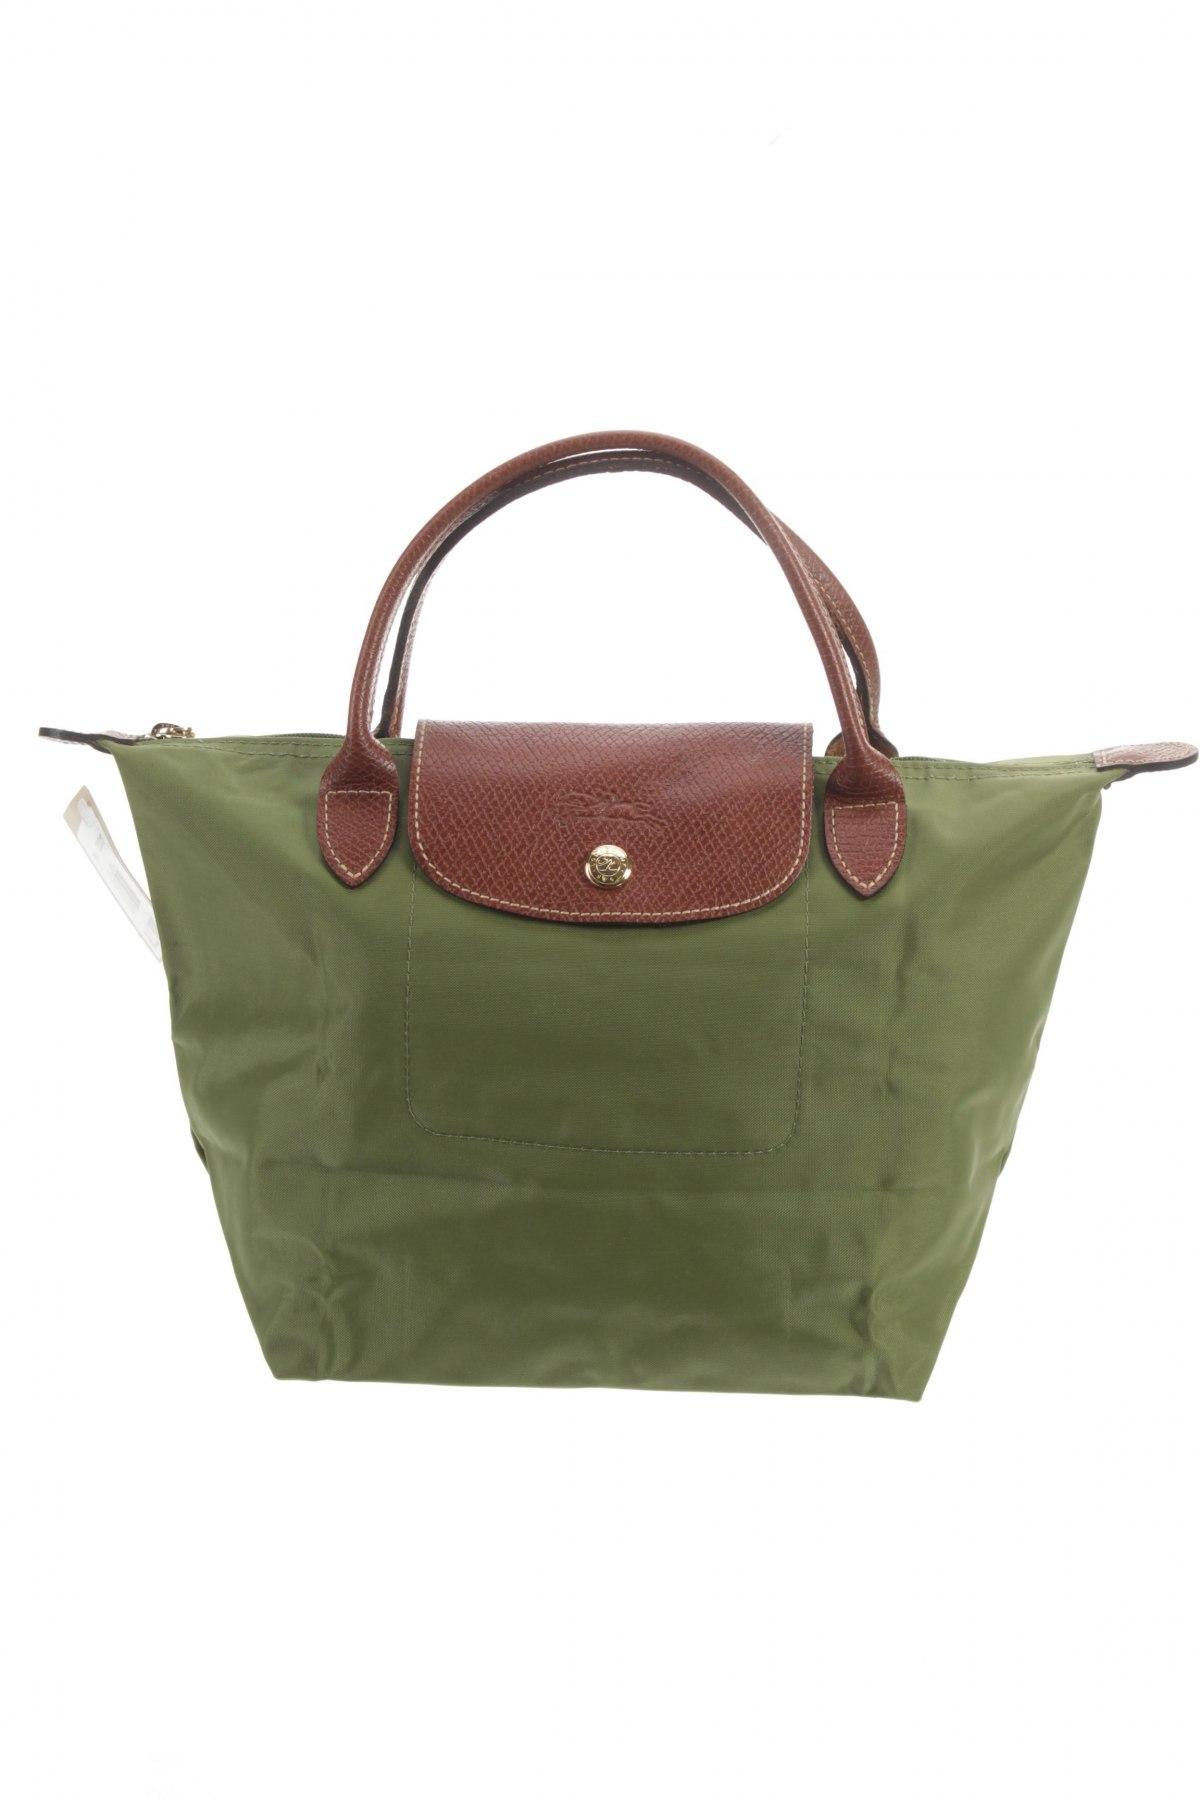 cd1d68105d Γυναικεία τσάντα Longchamp - σε συμφέρουσα τιμή στο Remix -  7608778